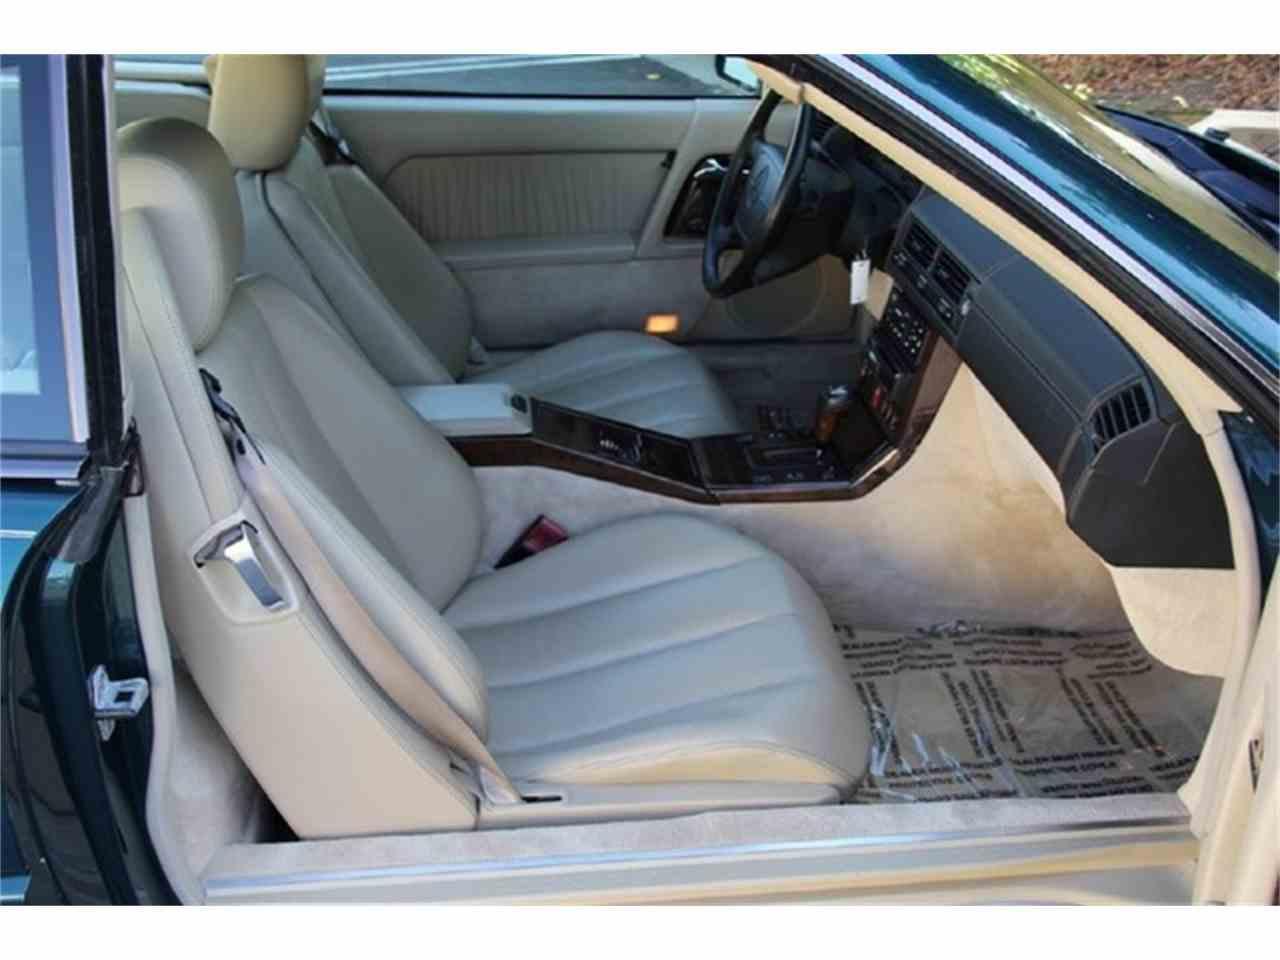 1995 mercedes benz sl600 for sale cc for Mercedes benz long beach service